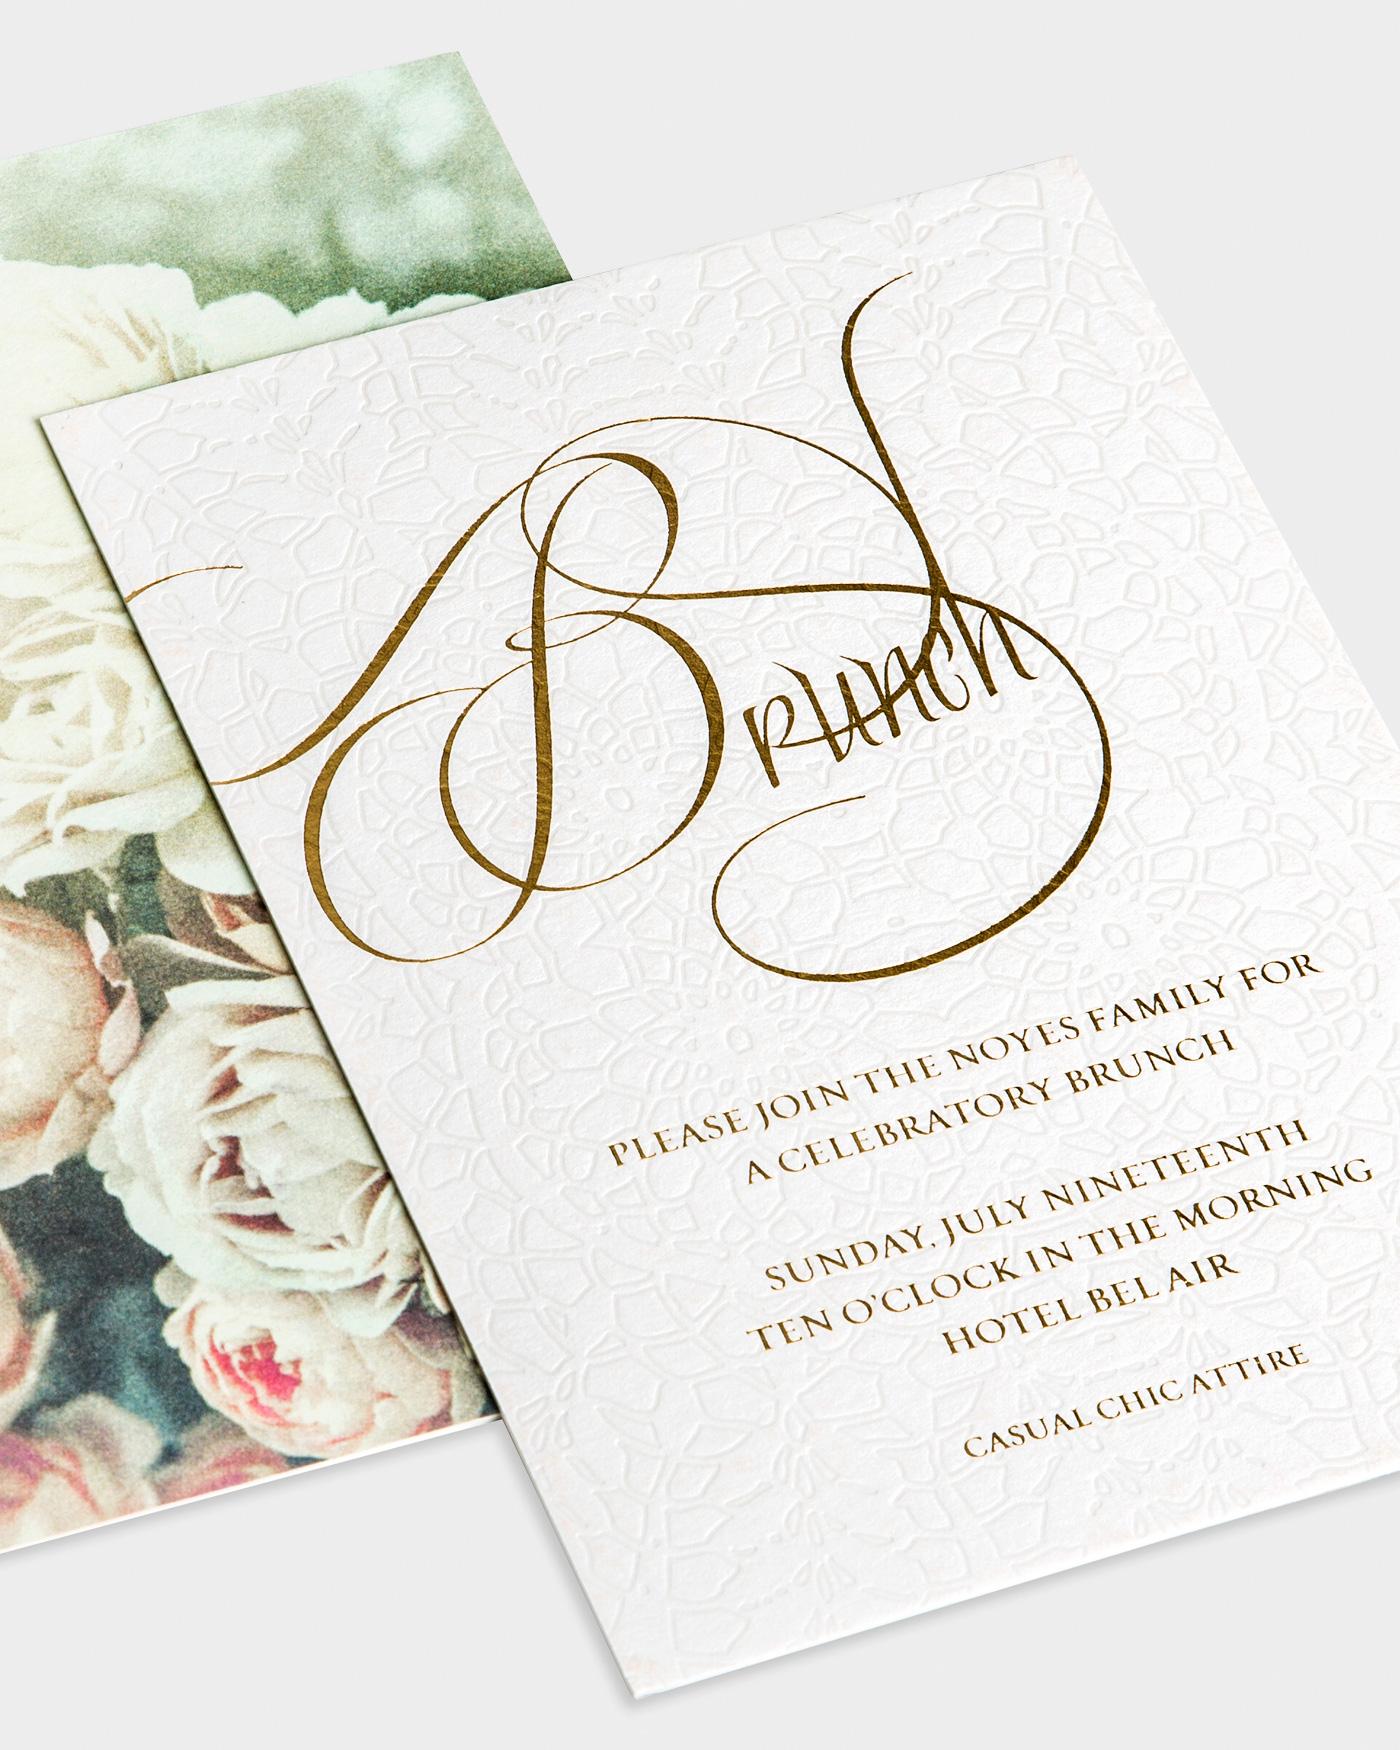 wedding-weekend-ideas-sunday-brunch-0416.jpg